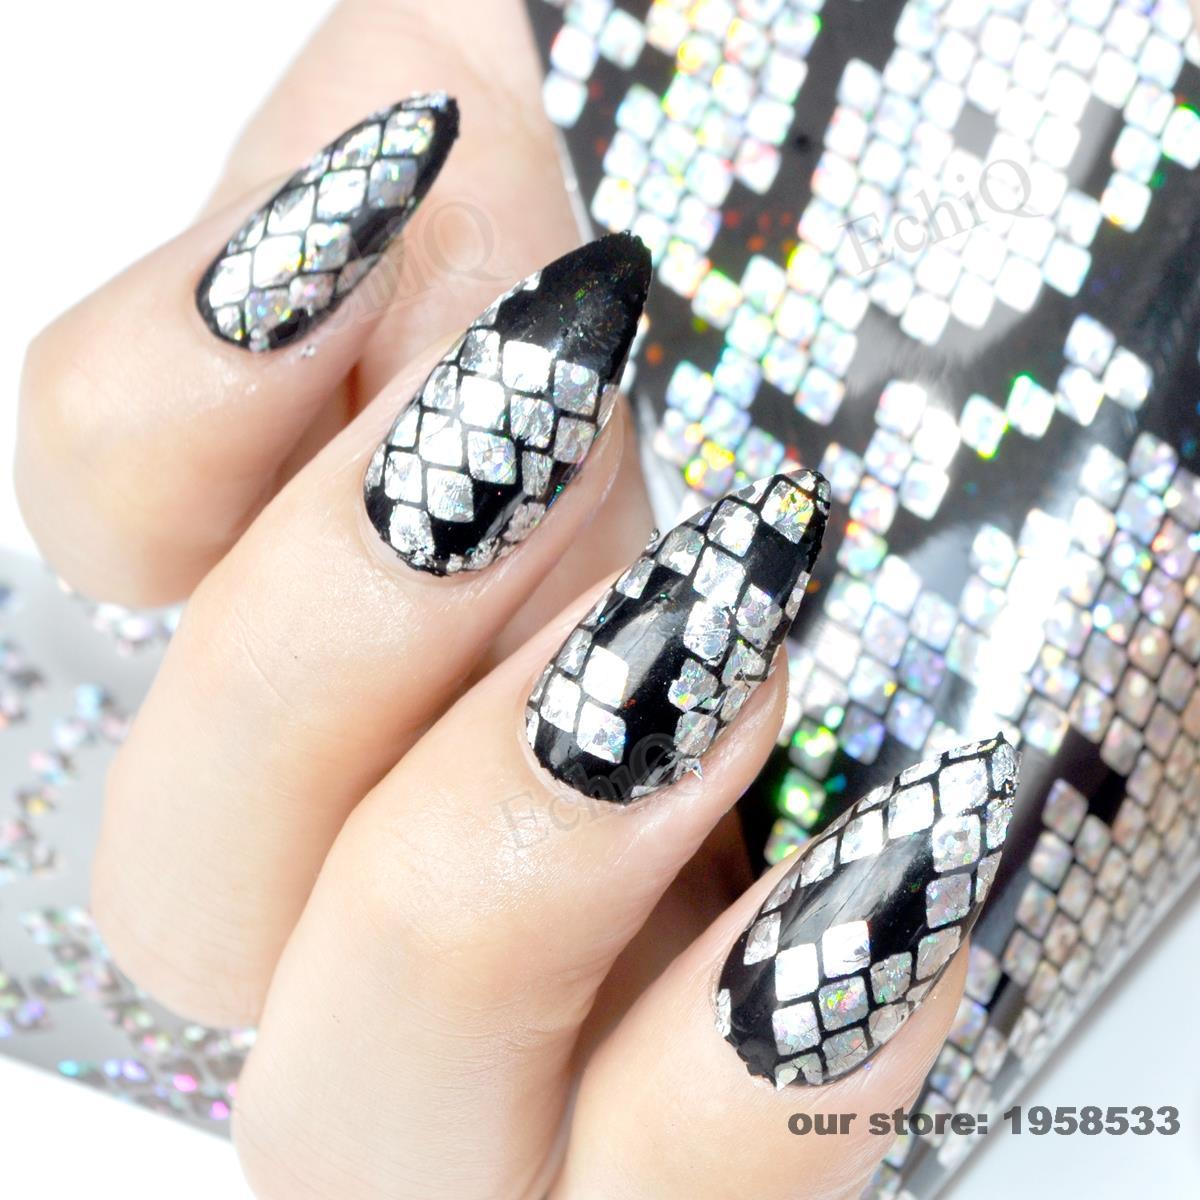 Nail Art Ideas nail art online store : 100cmx4cm Holographic Nail Art Transfer Foils Sticker Shiny Snake ...